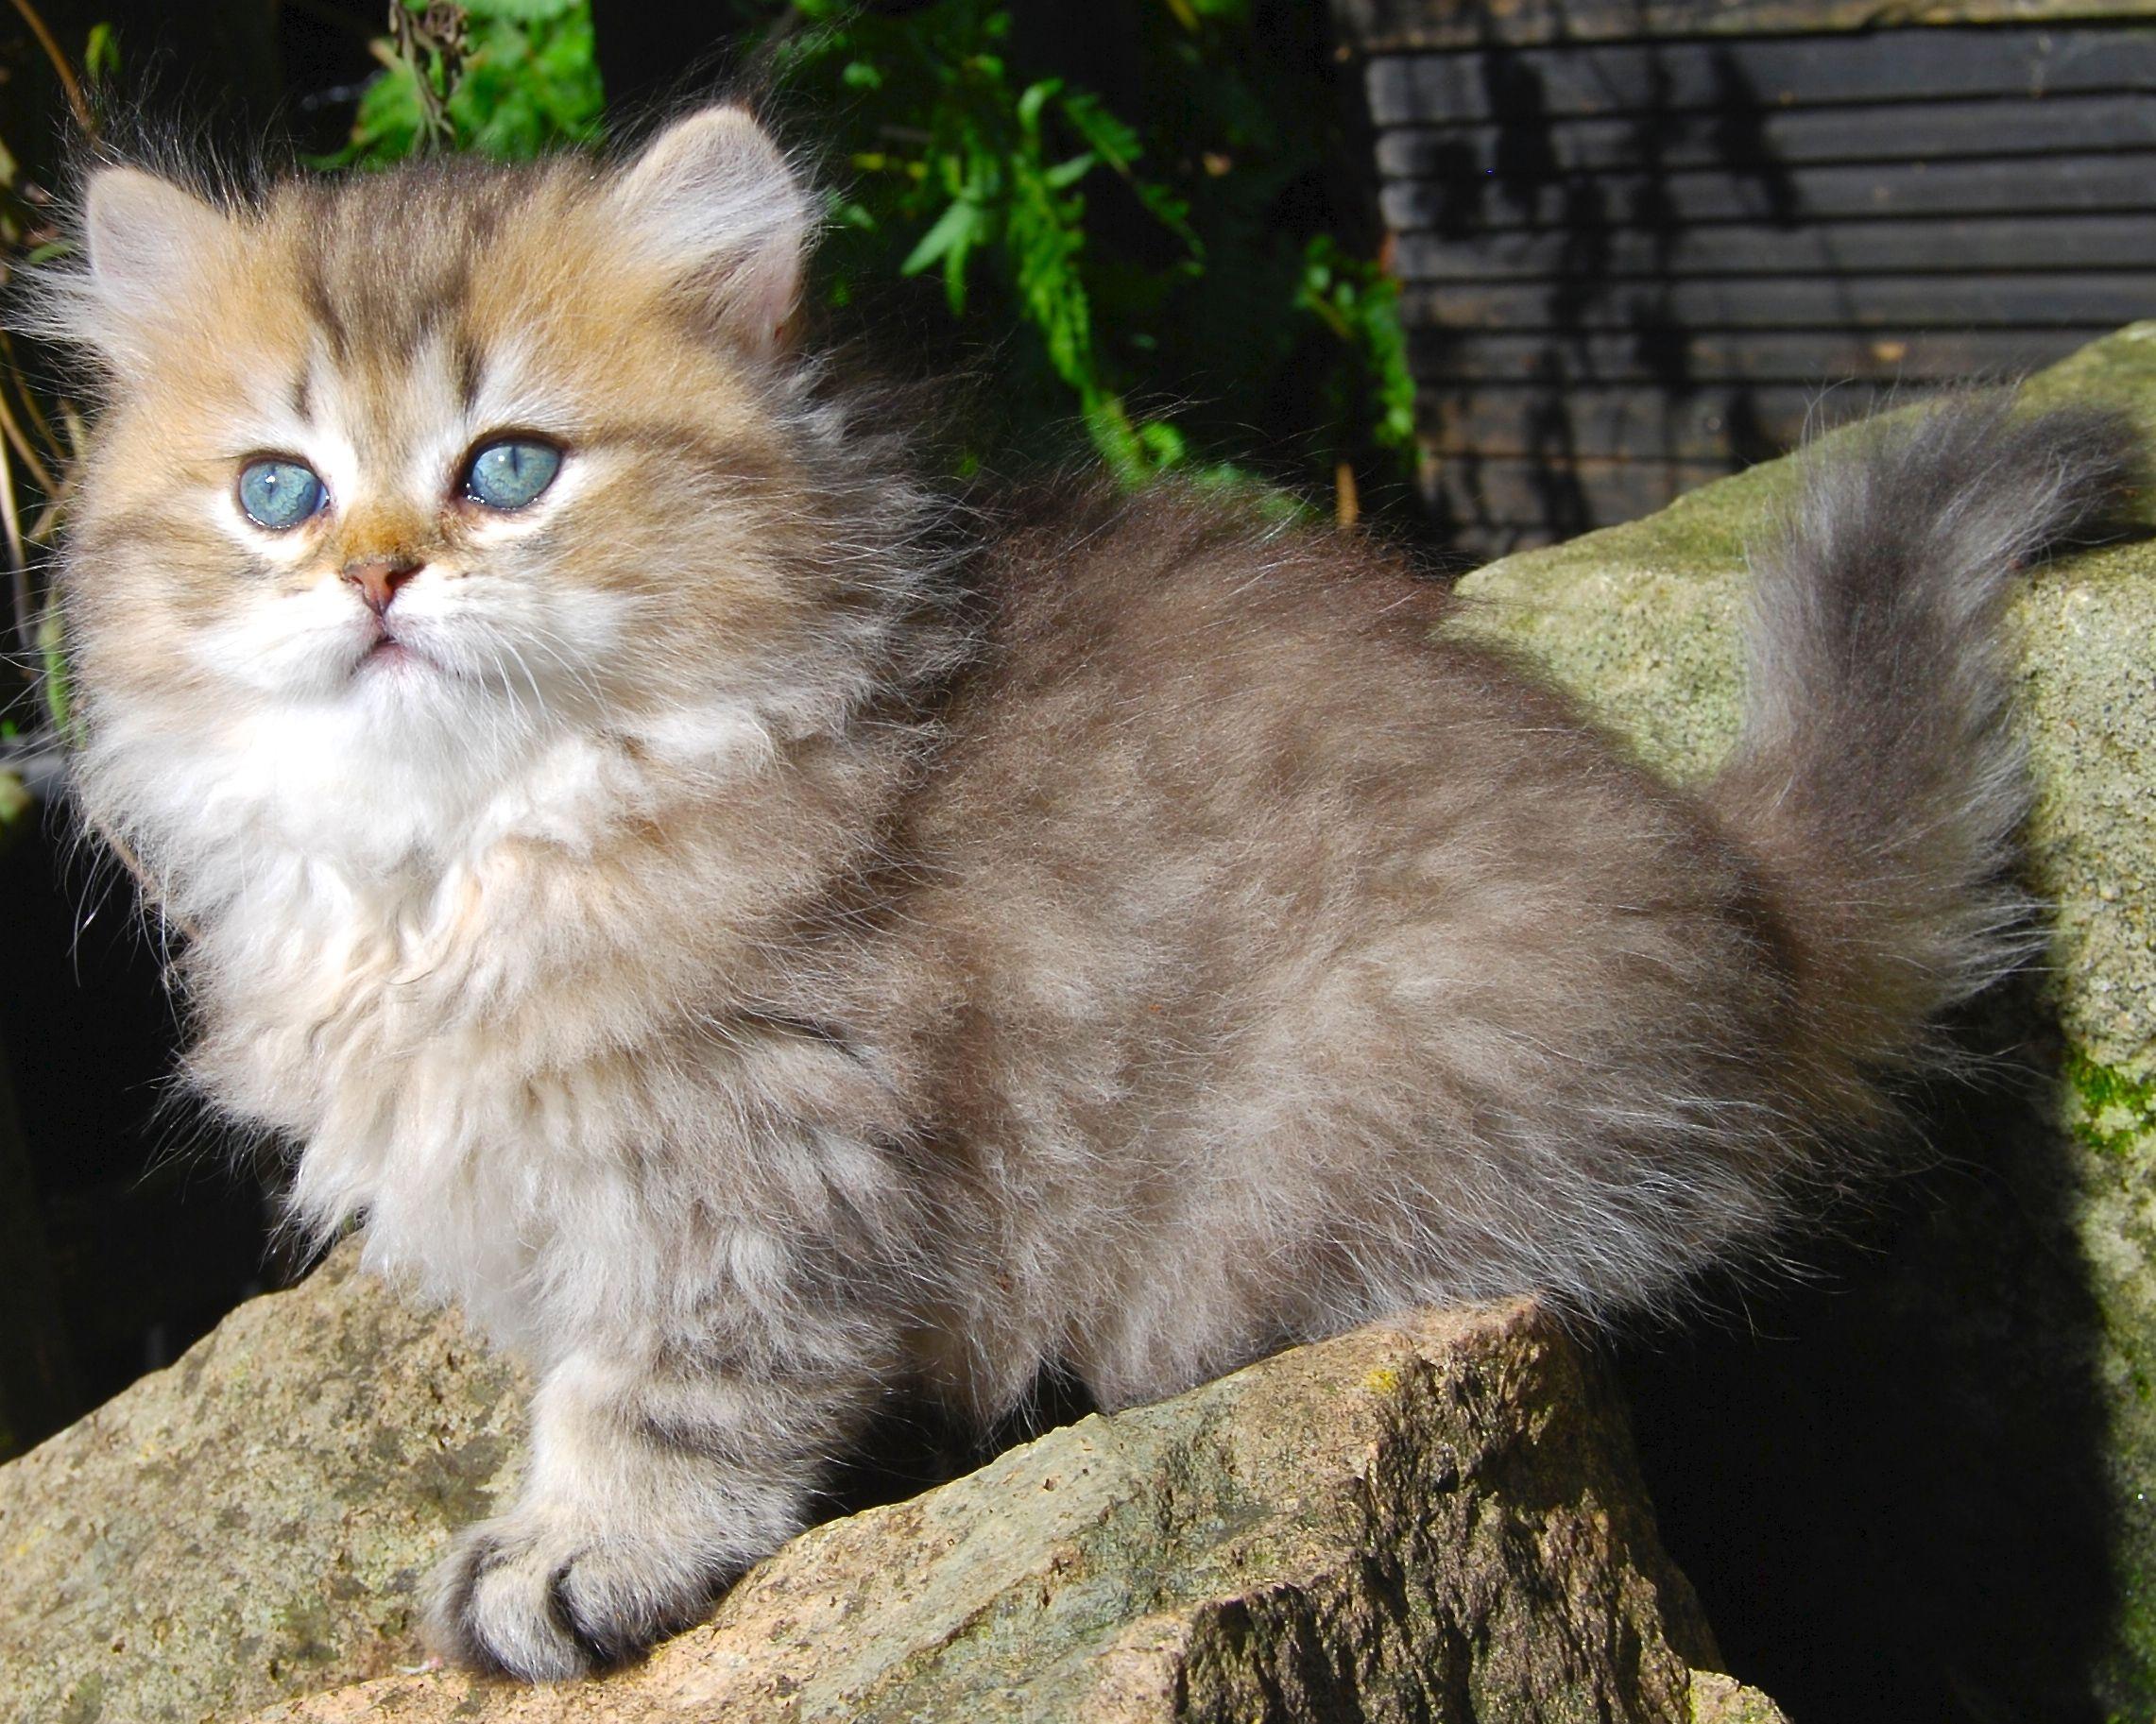 Belle Ayr Solar Sun Kiss Cats And Kittens British Shorthair Cats Kittens